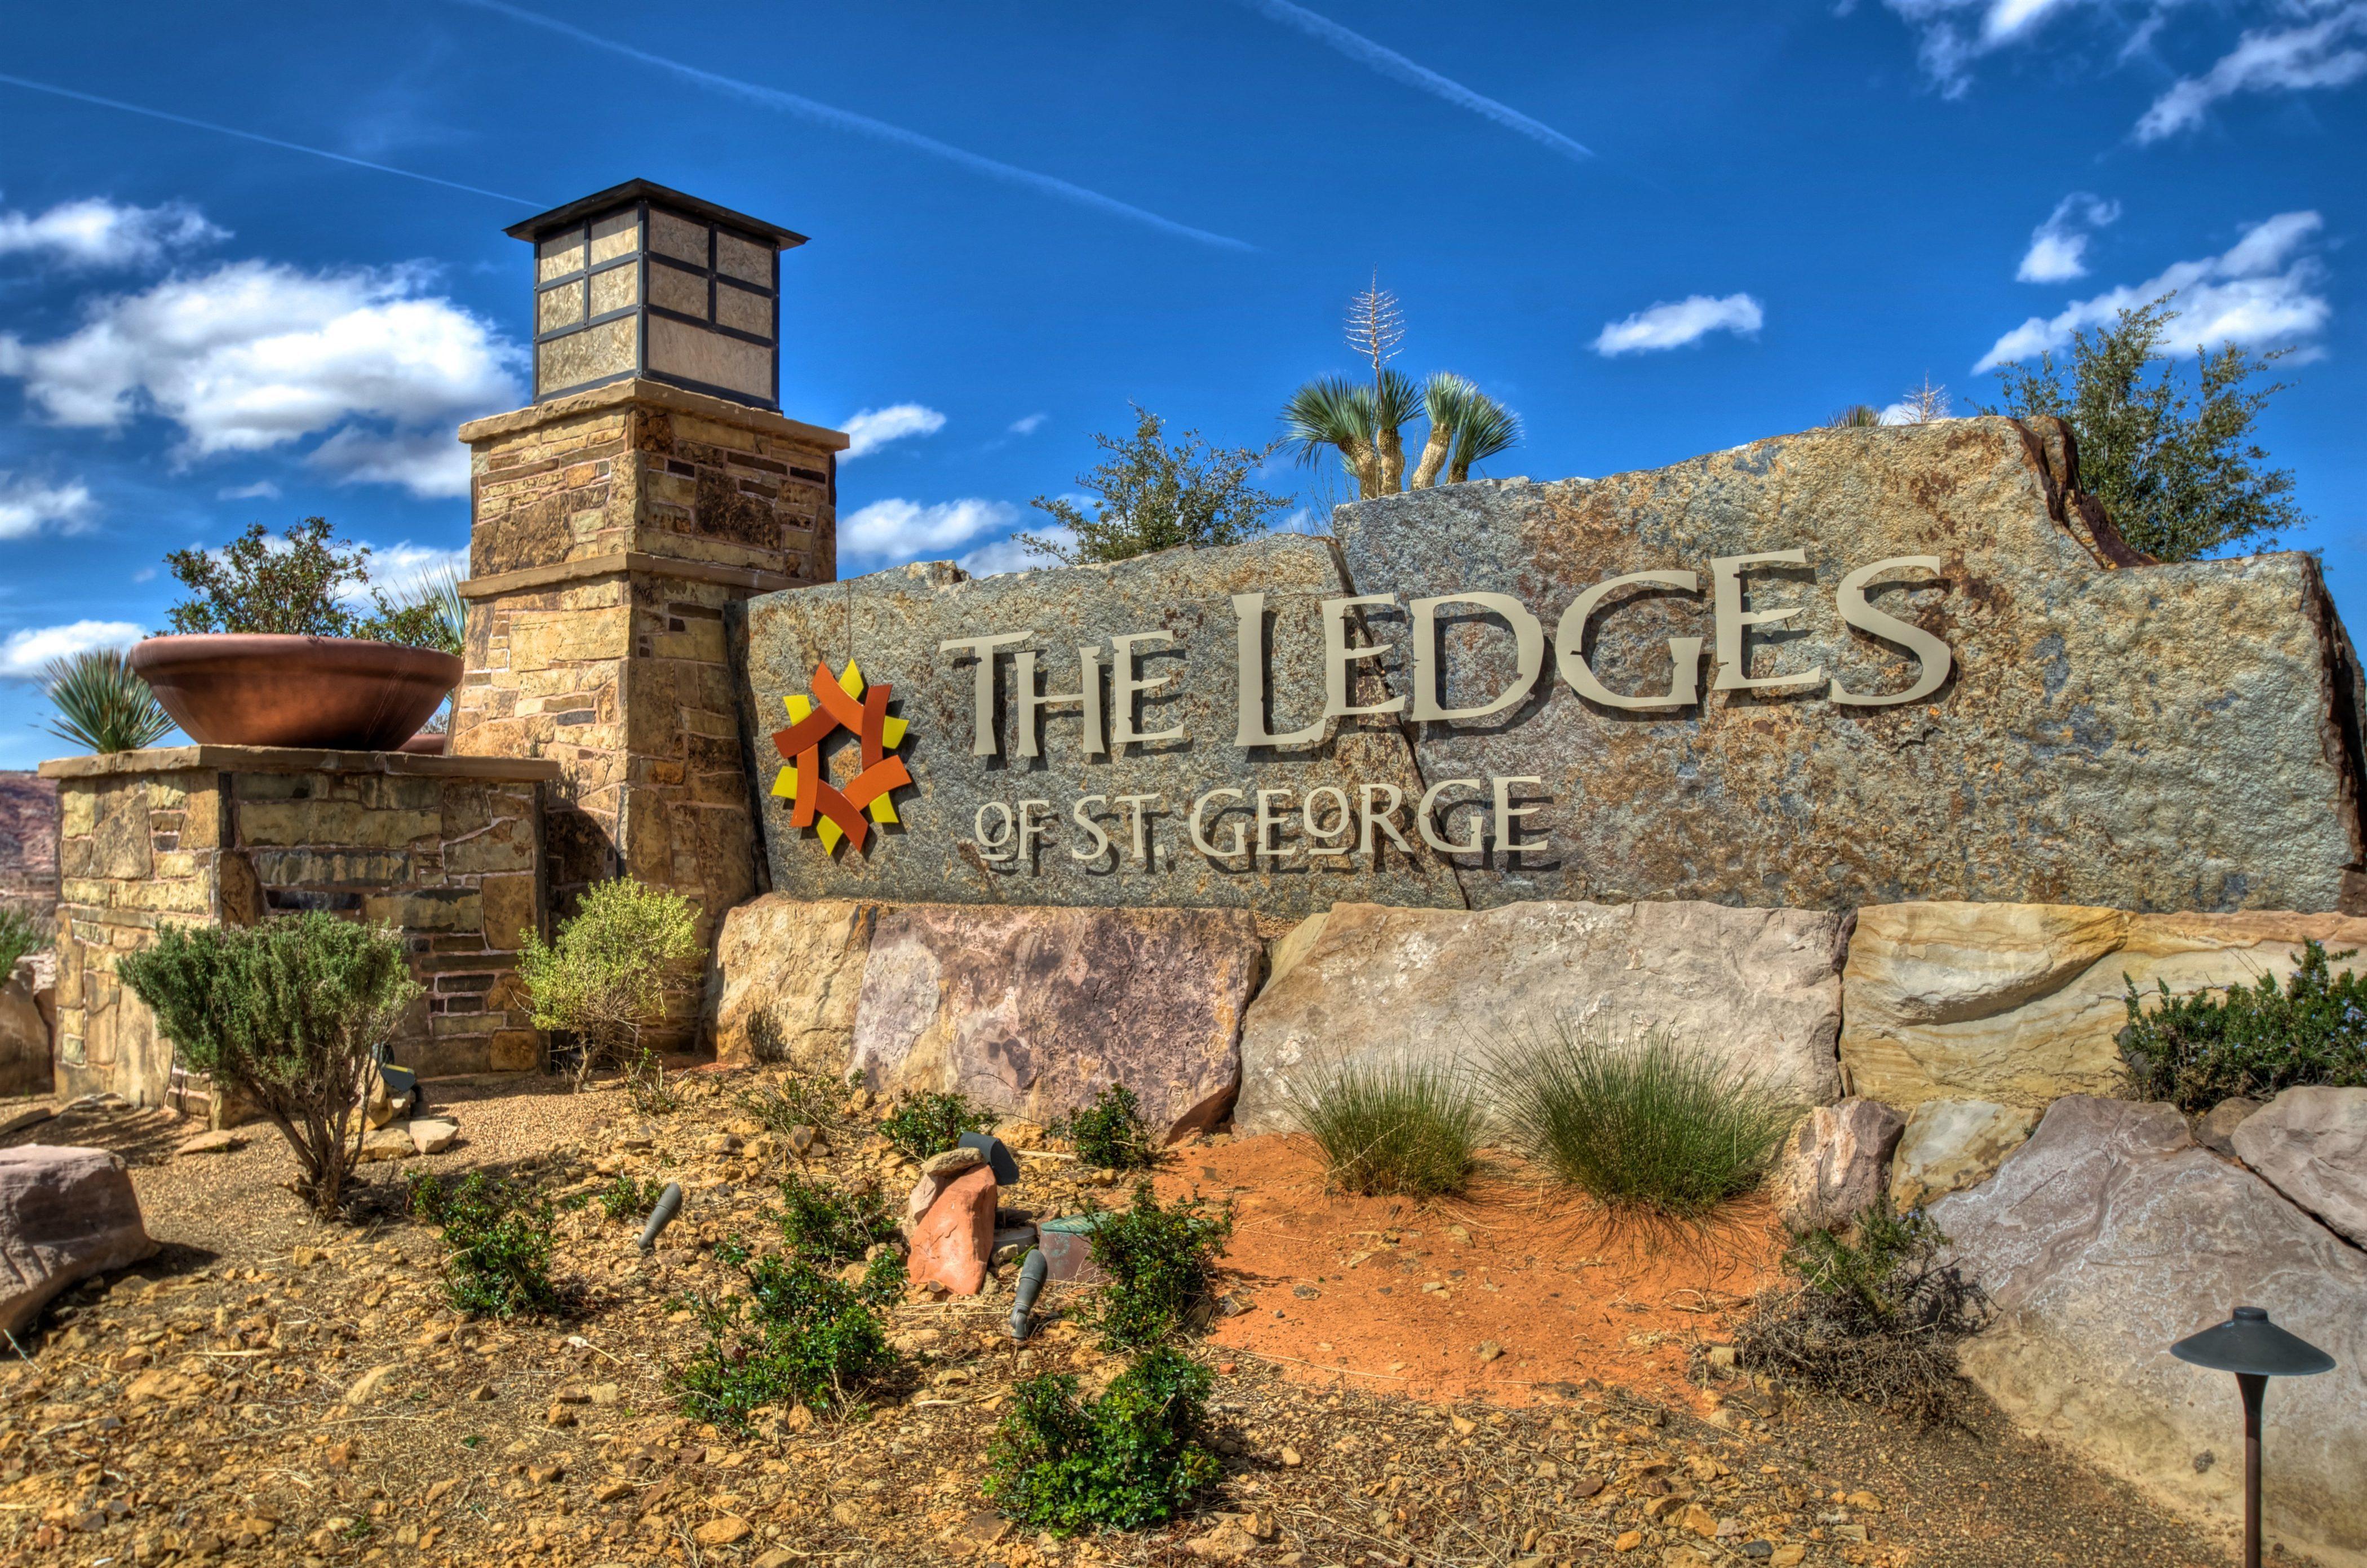 Terreno por un Venta en Spectacular Ledges View Lot Lot 234 Rising Sun Drive St. George, Utah, 84770 Estados Unidos